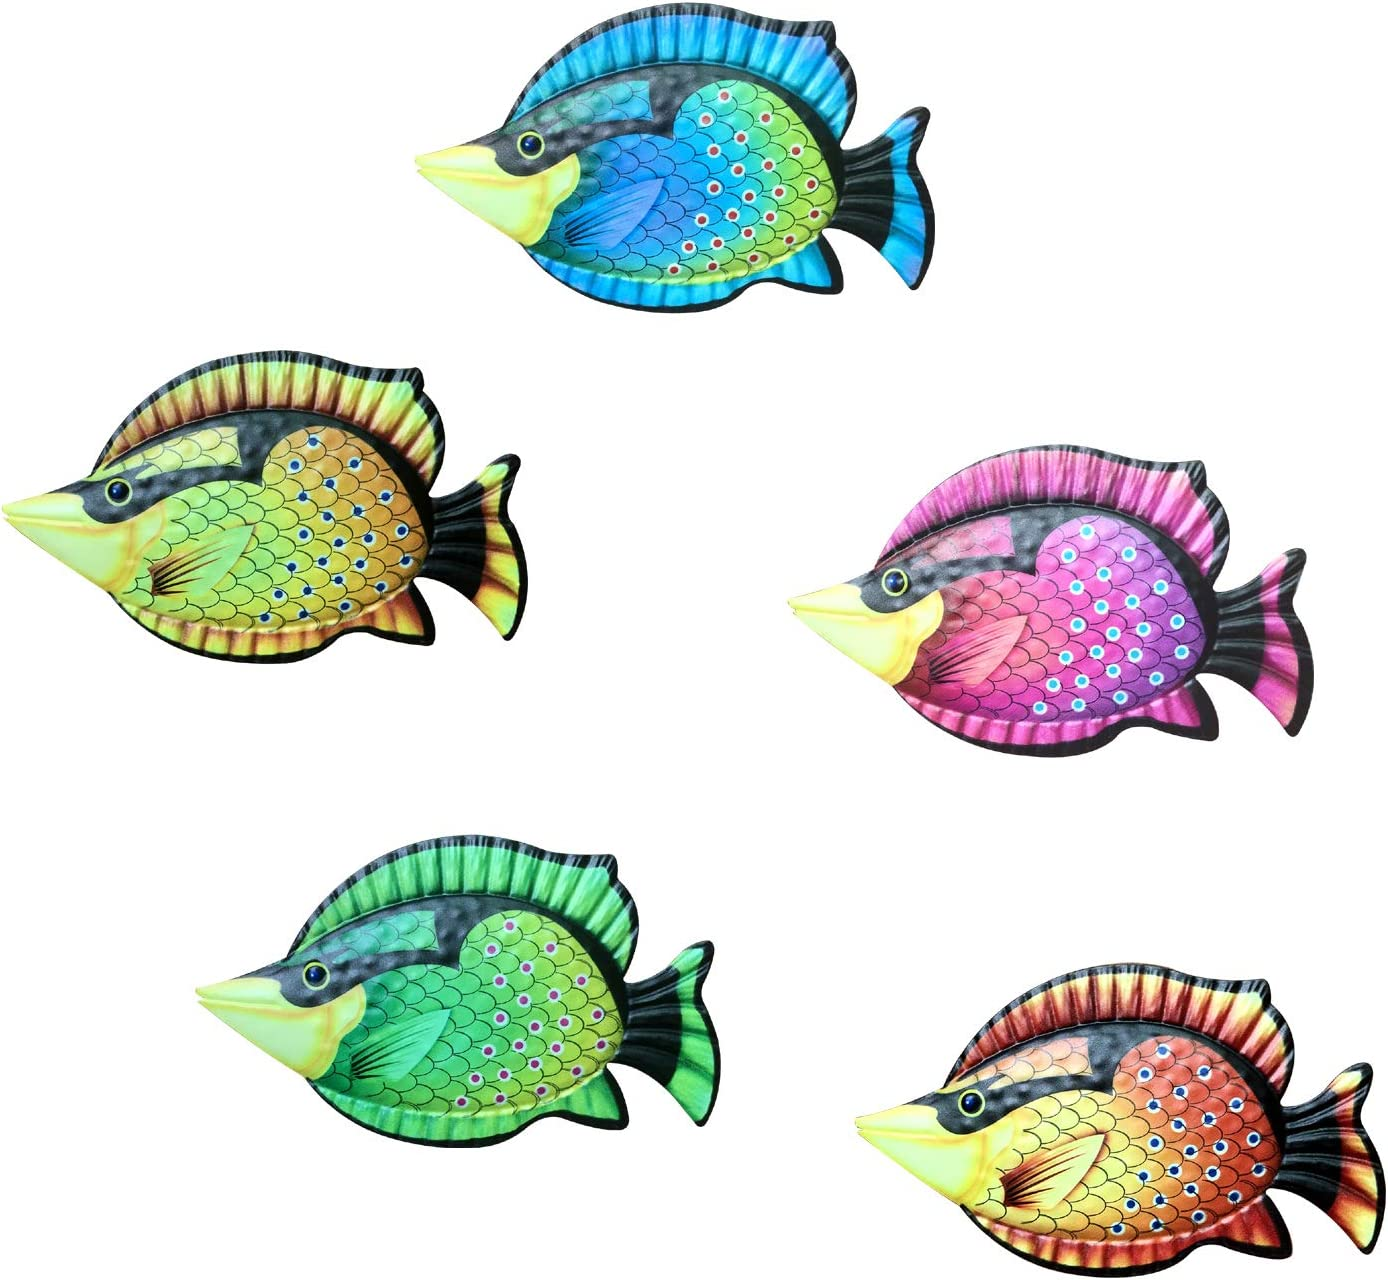 Funlive Wall Sculptures Coastal Ocean Sea Metal Fish Hanging Wall Art Decor Set of 5 for Outdoor or Indoor